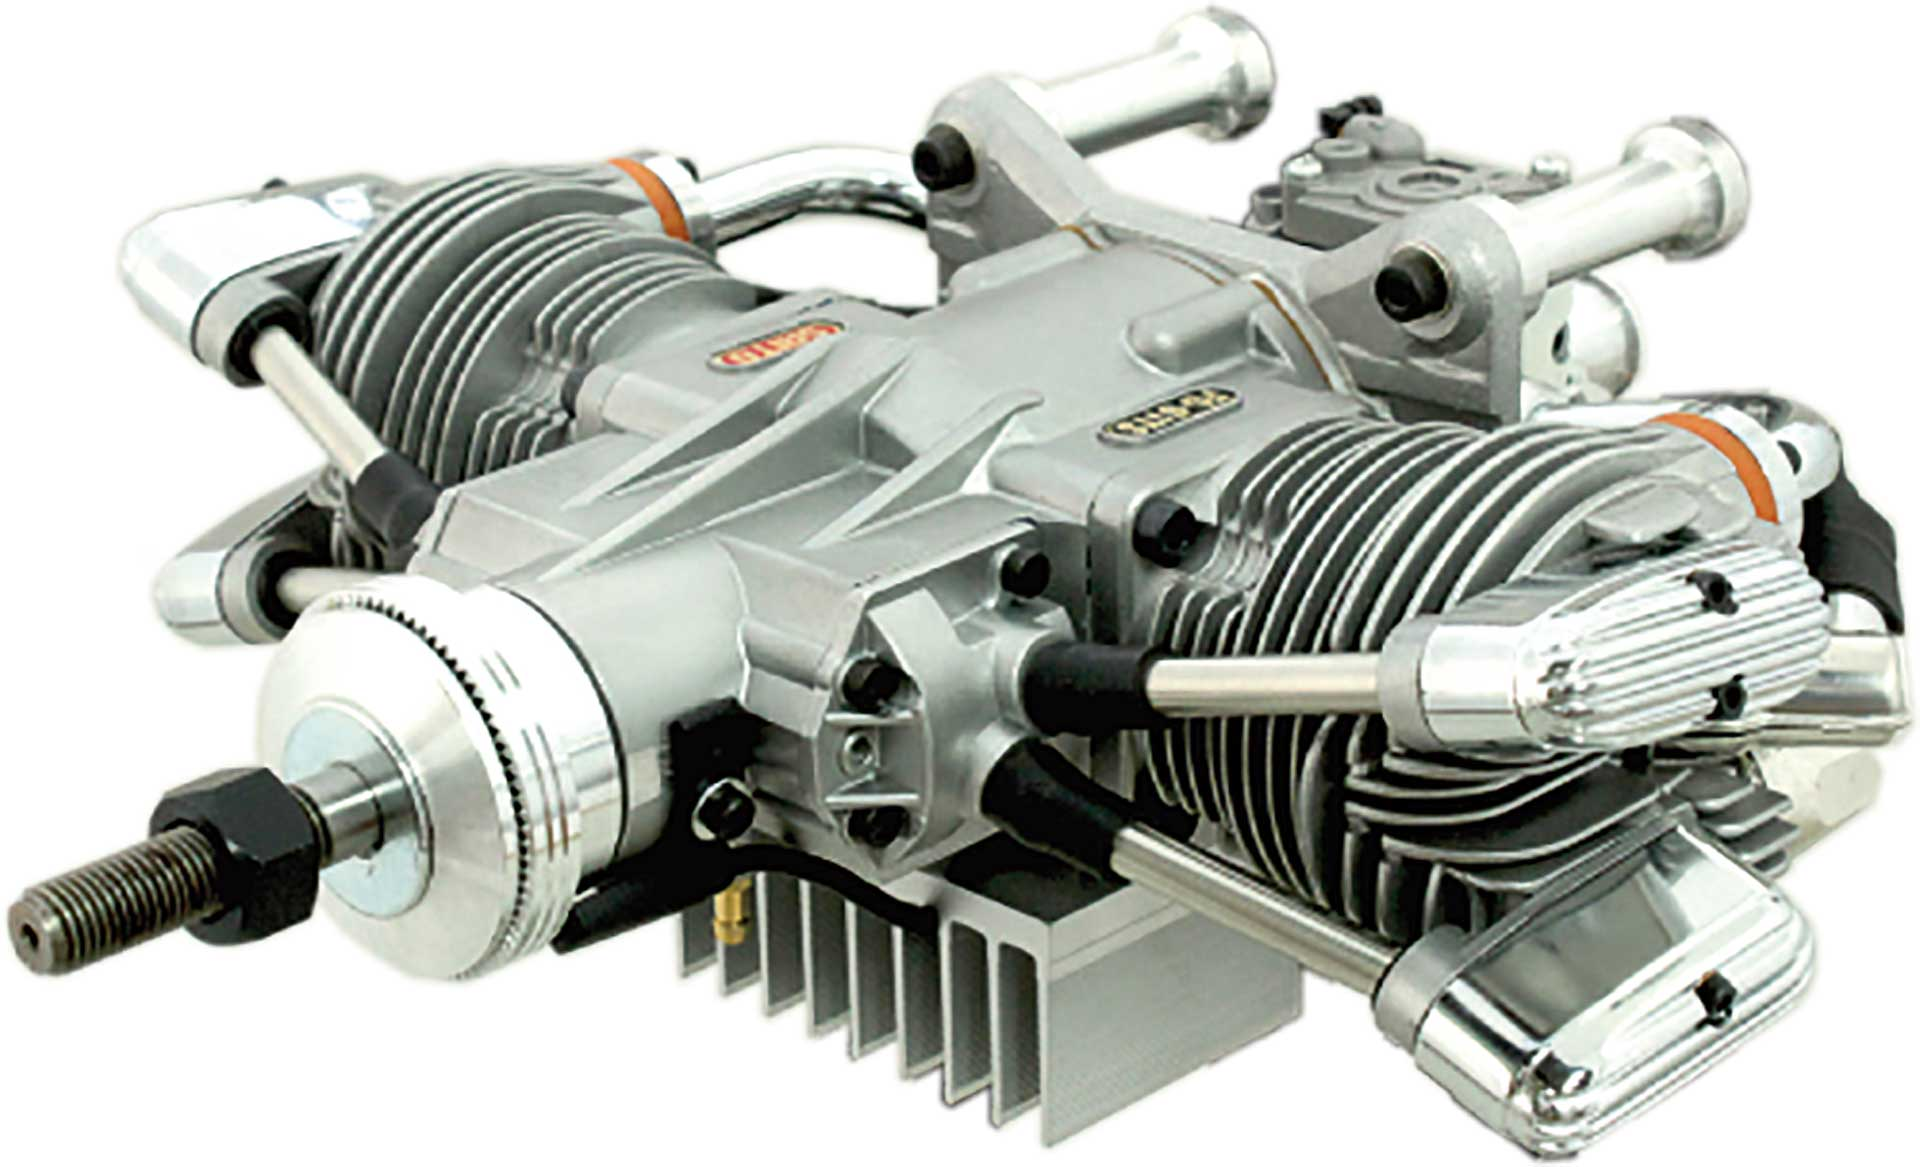 SAITO FG-61TS BENZIN BOXER MOTOR 2-ZYLINDER